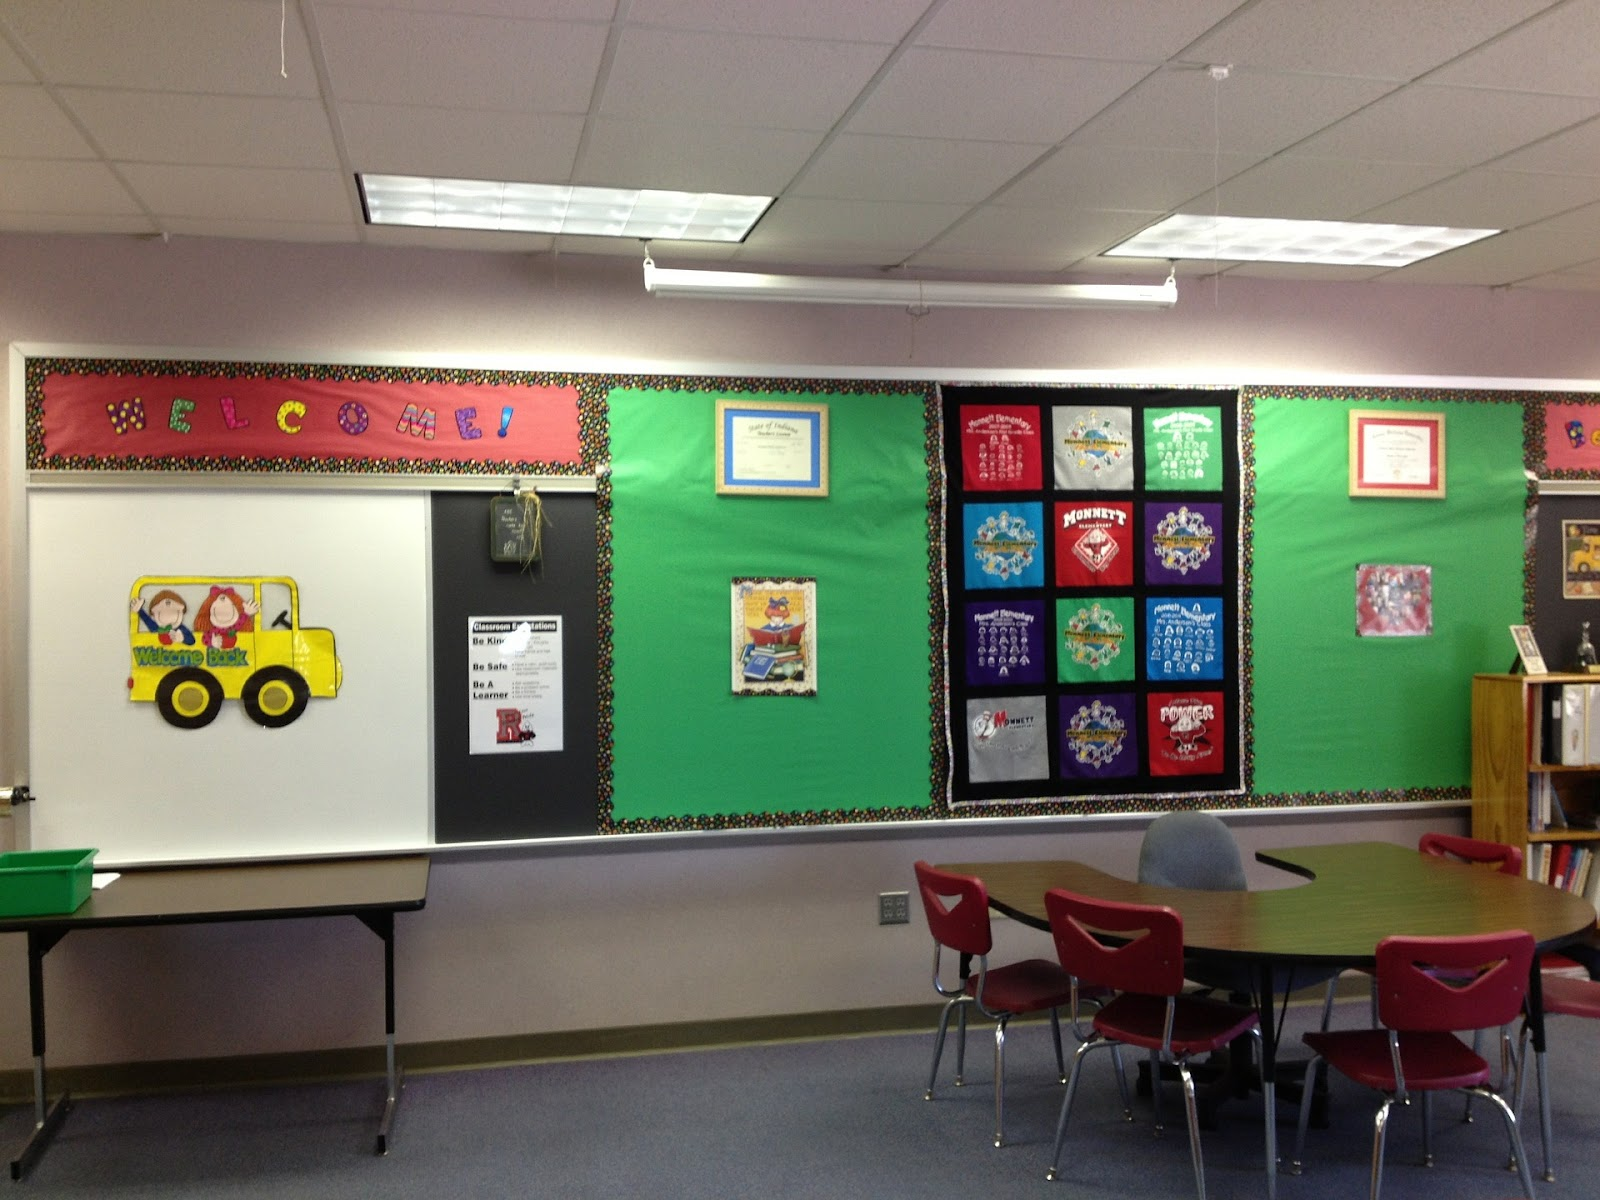 classroom-435227_1920.jpg